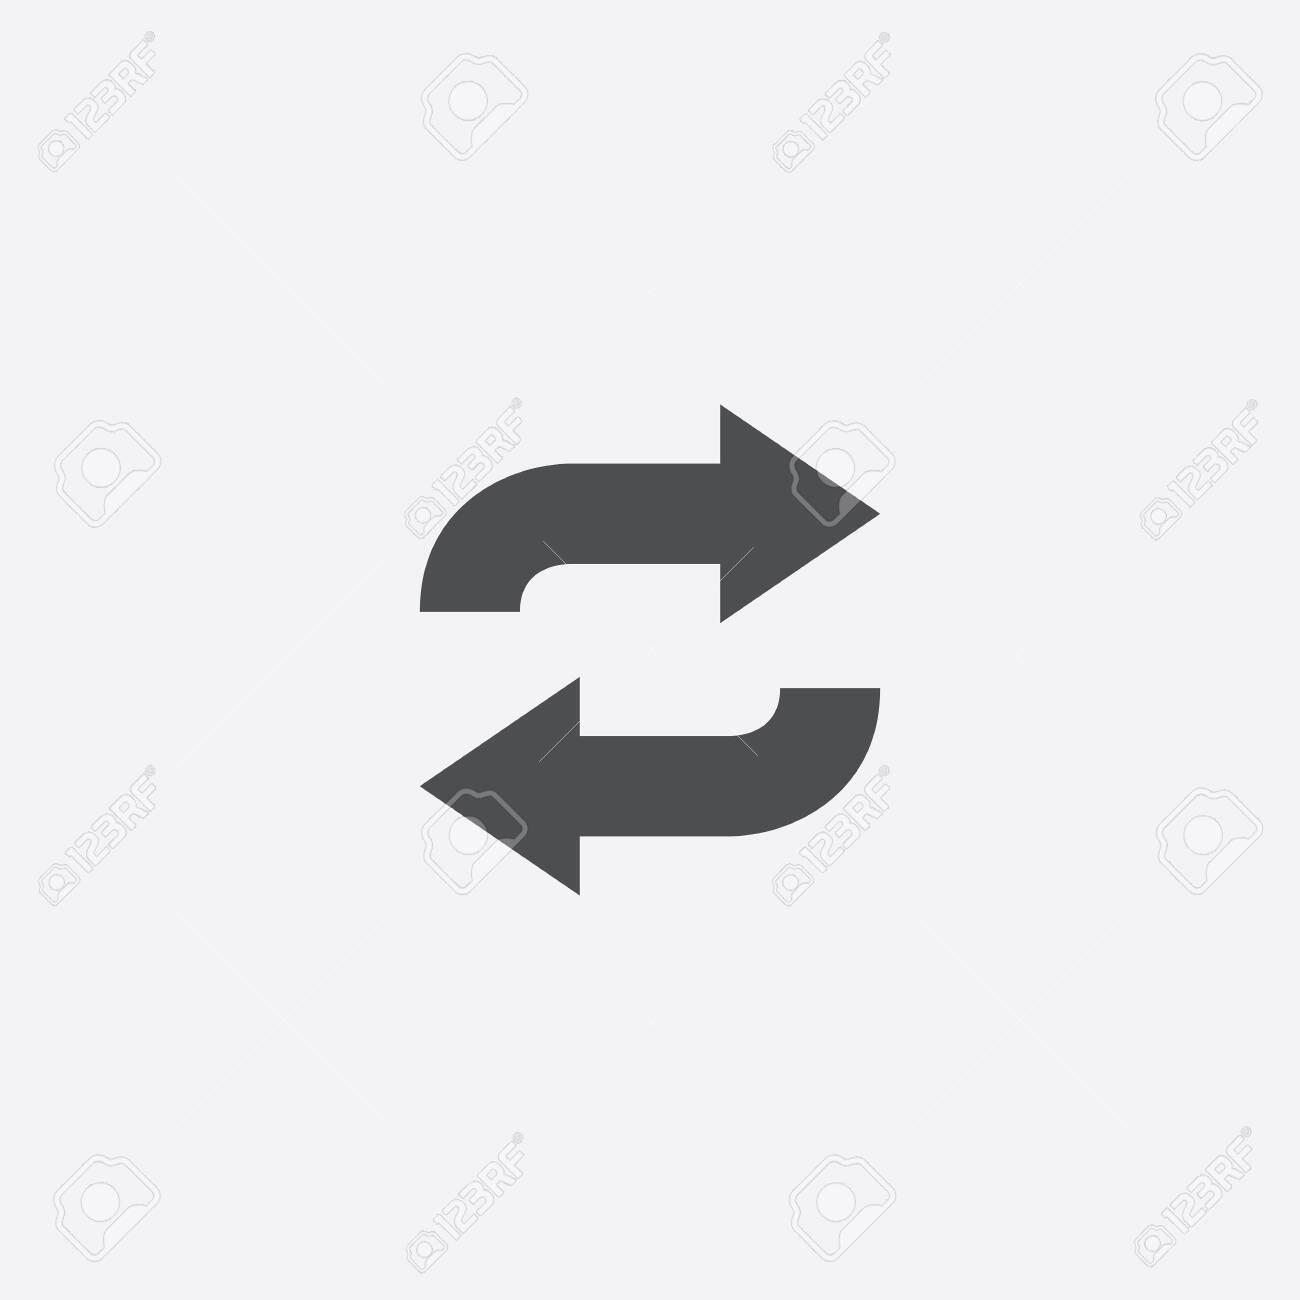 auto play outline icon - 143431828